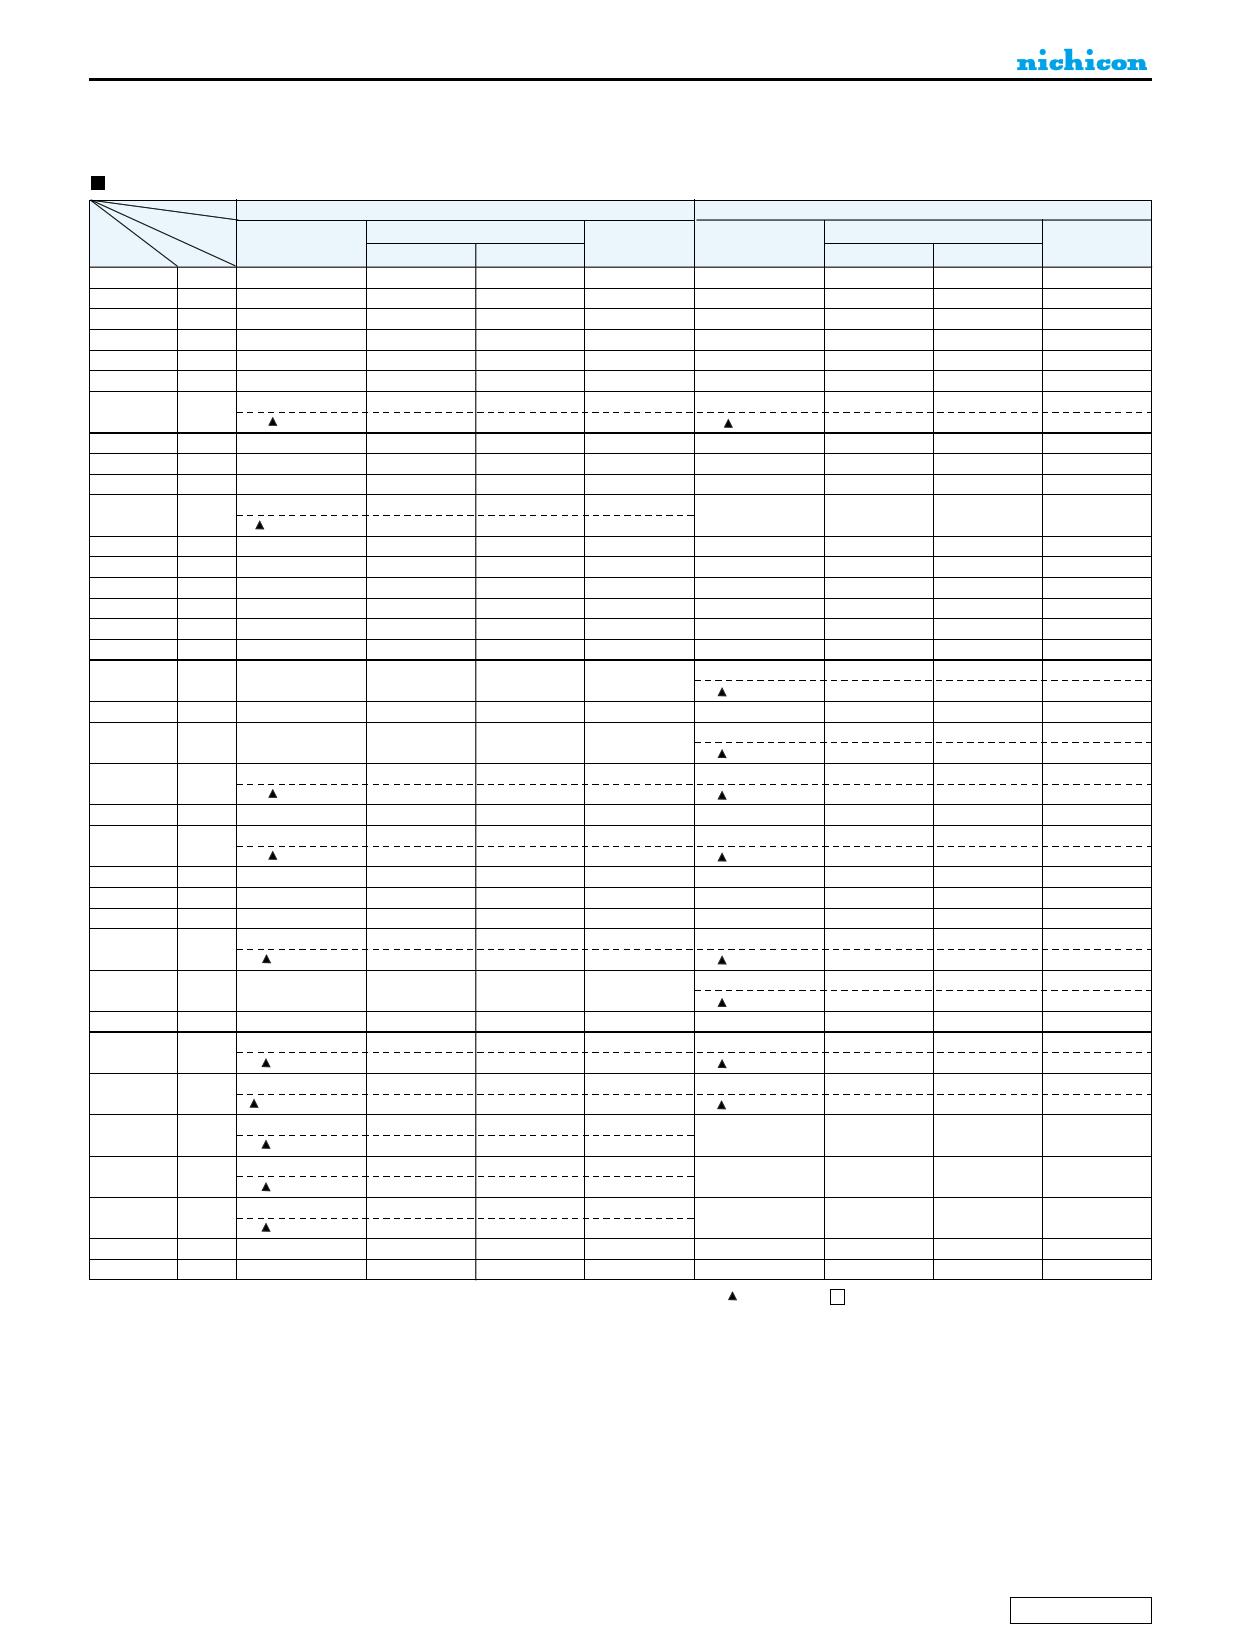 UPW1H152MHD pdf, 반도체, 판매, 대치품